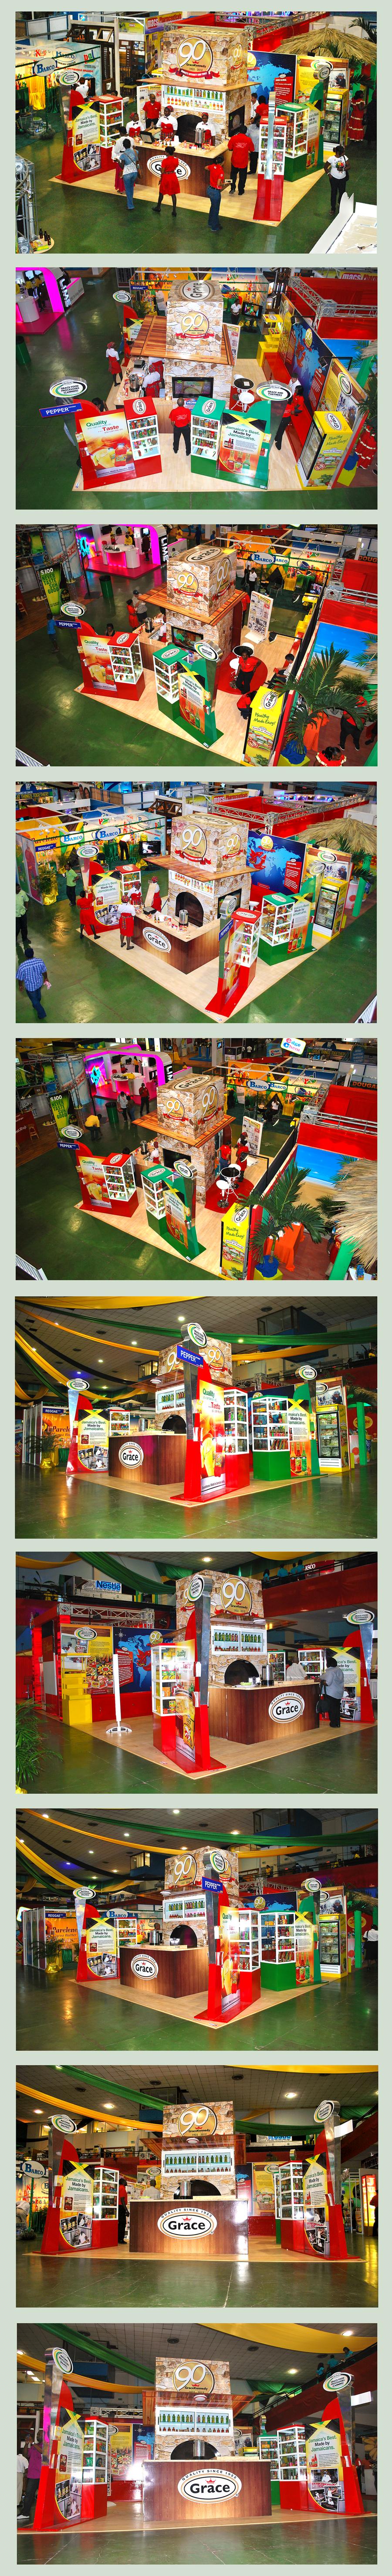 Grace_JMA_JEA_Expo Booth by innografiks